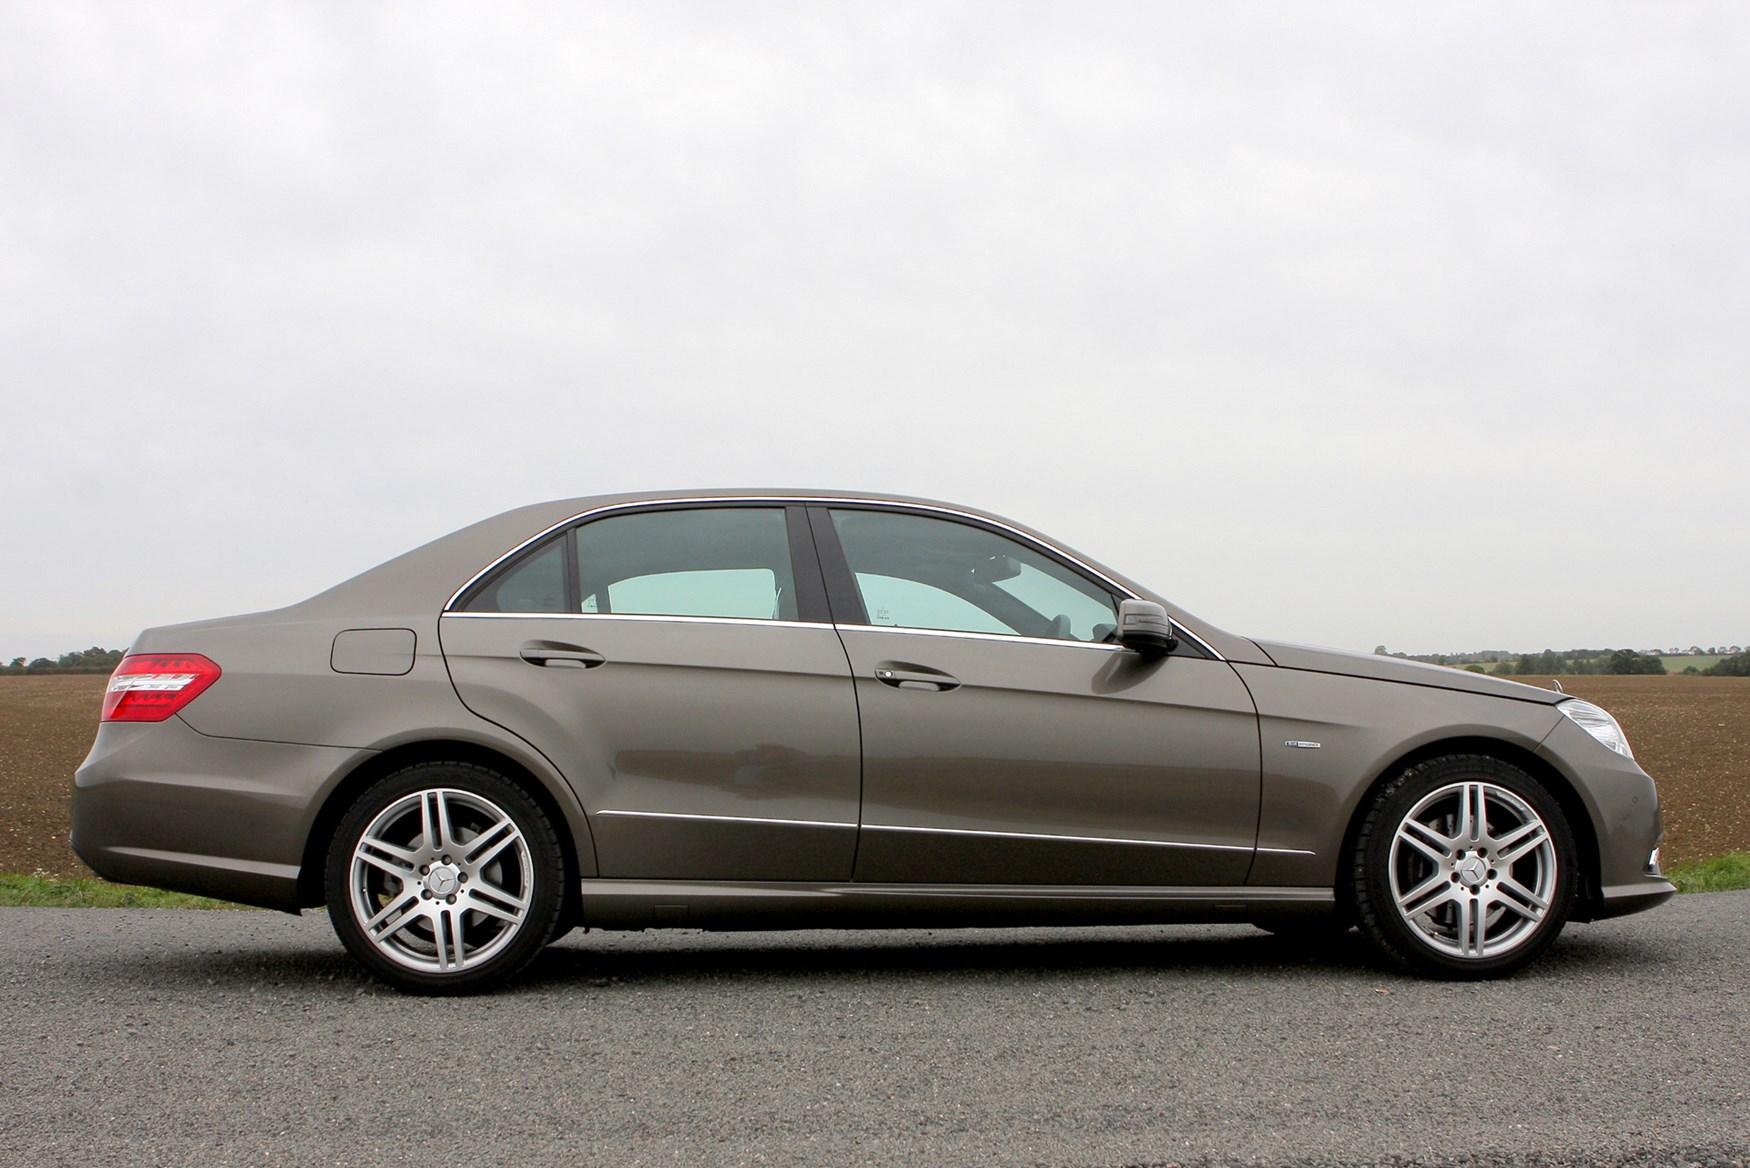 Mercedes benz e class saloon 2009 2016 photos parkers for Mercedes benz e class 2009